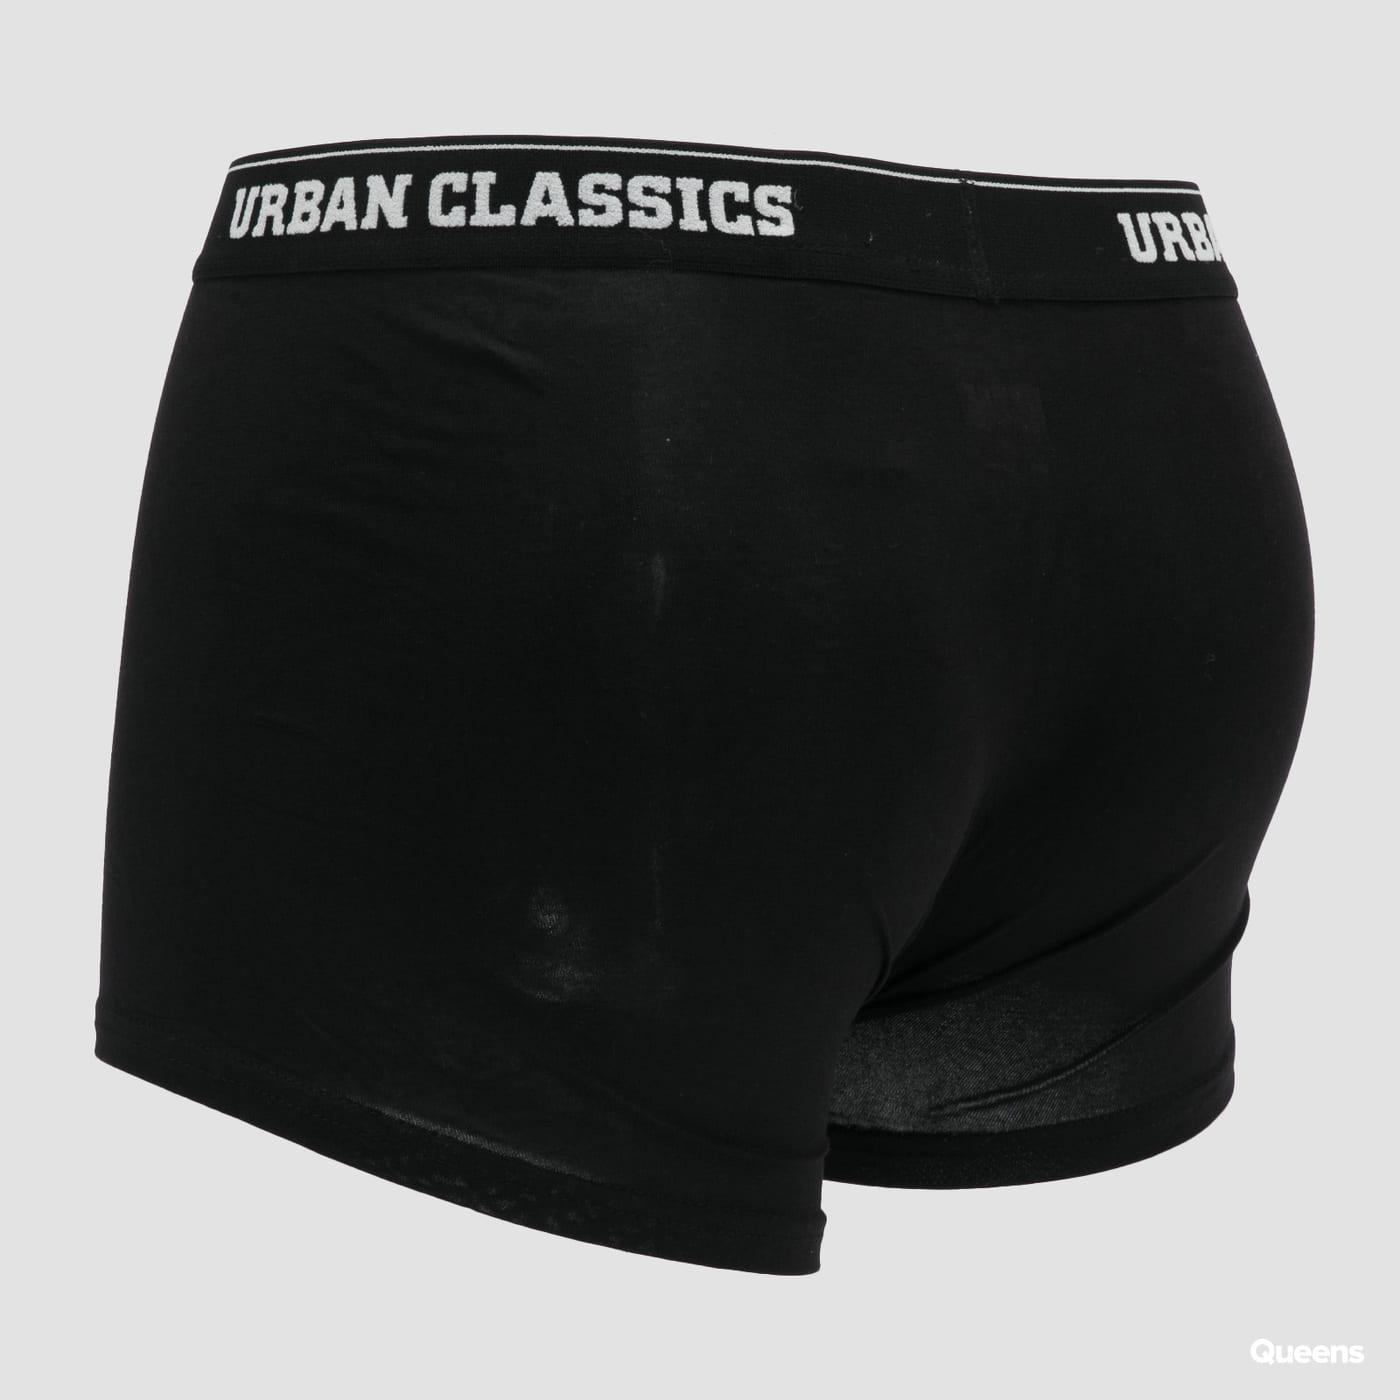 Urban Classics Boxer Shorts 5-Pack black / dark gray / navy